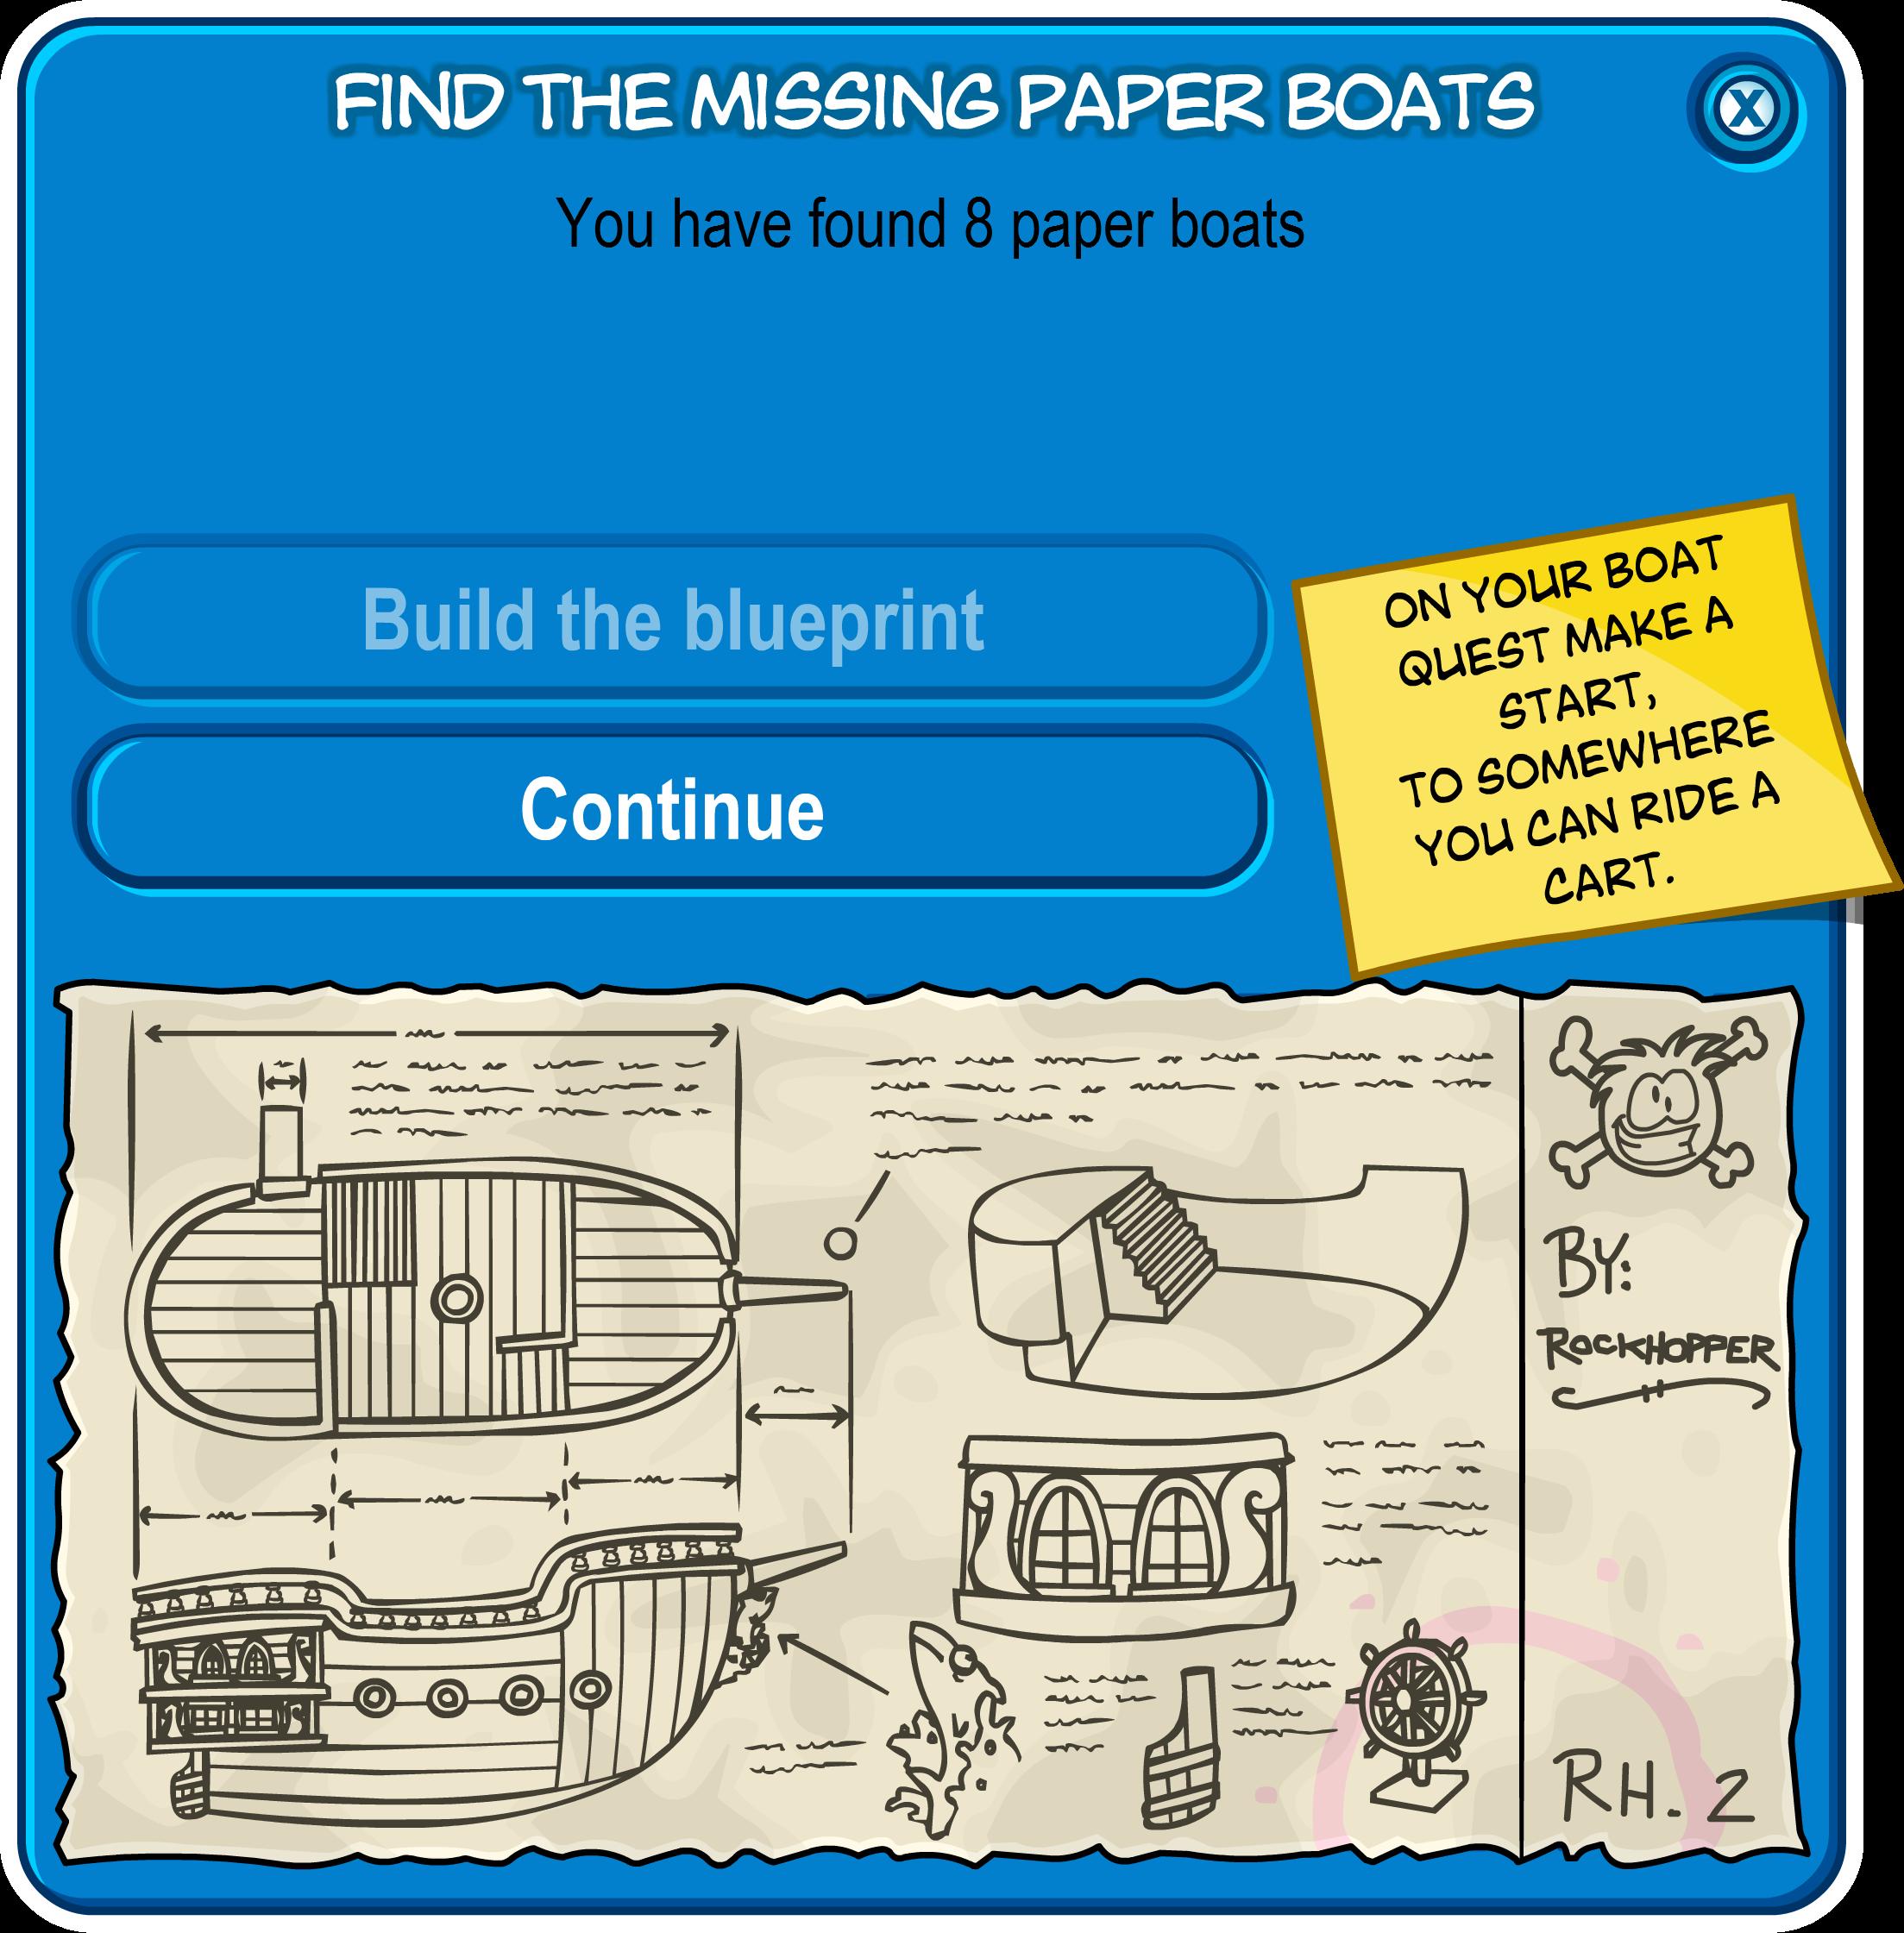 Image paper boat scavenger hunt 2008 build the blueprintsg paper boat scavenger hunt 2008 build the blueprintsg malvernweather Choice Image